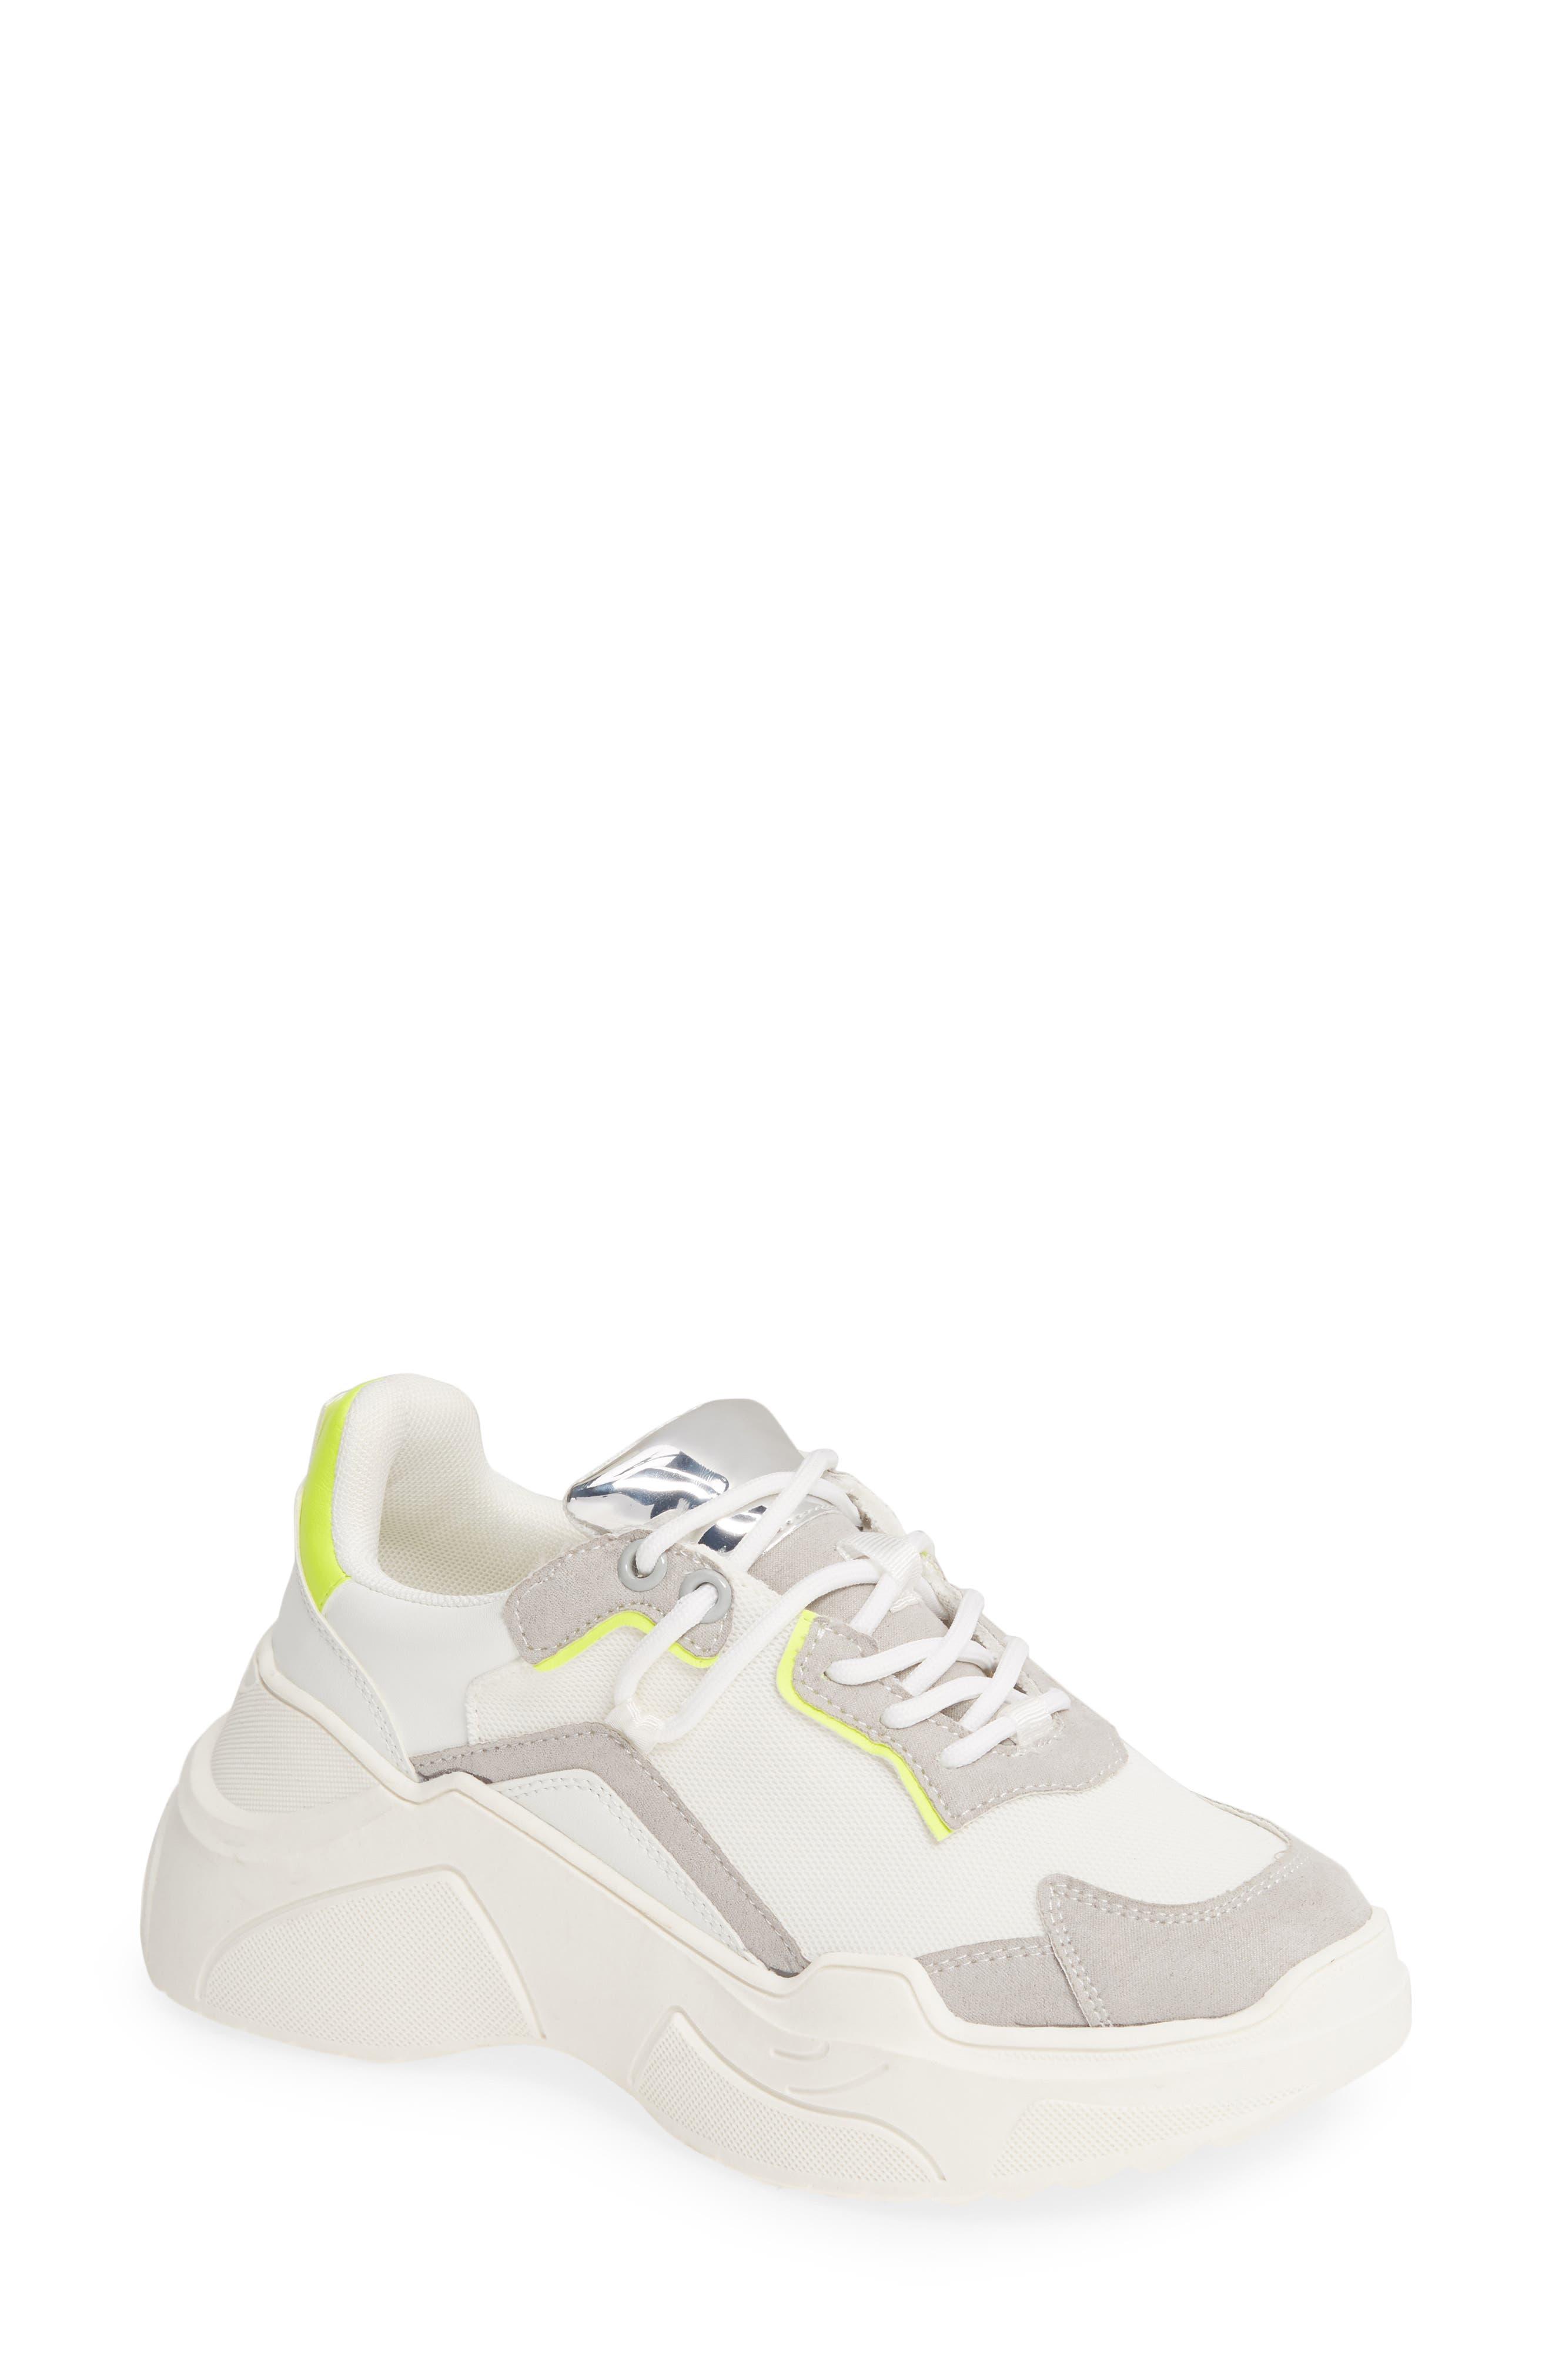 Topshop Cherry Chunky Sneaker - White